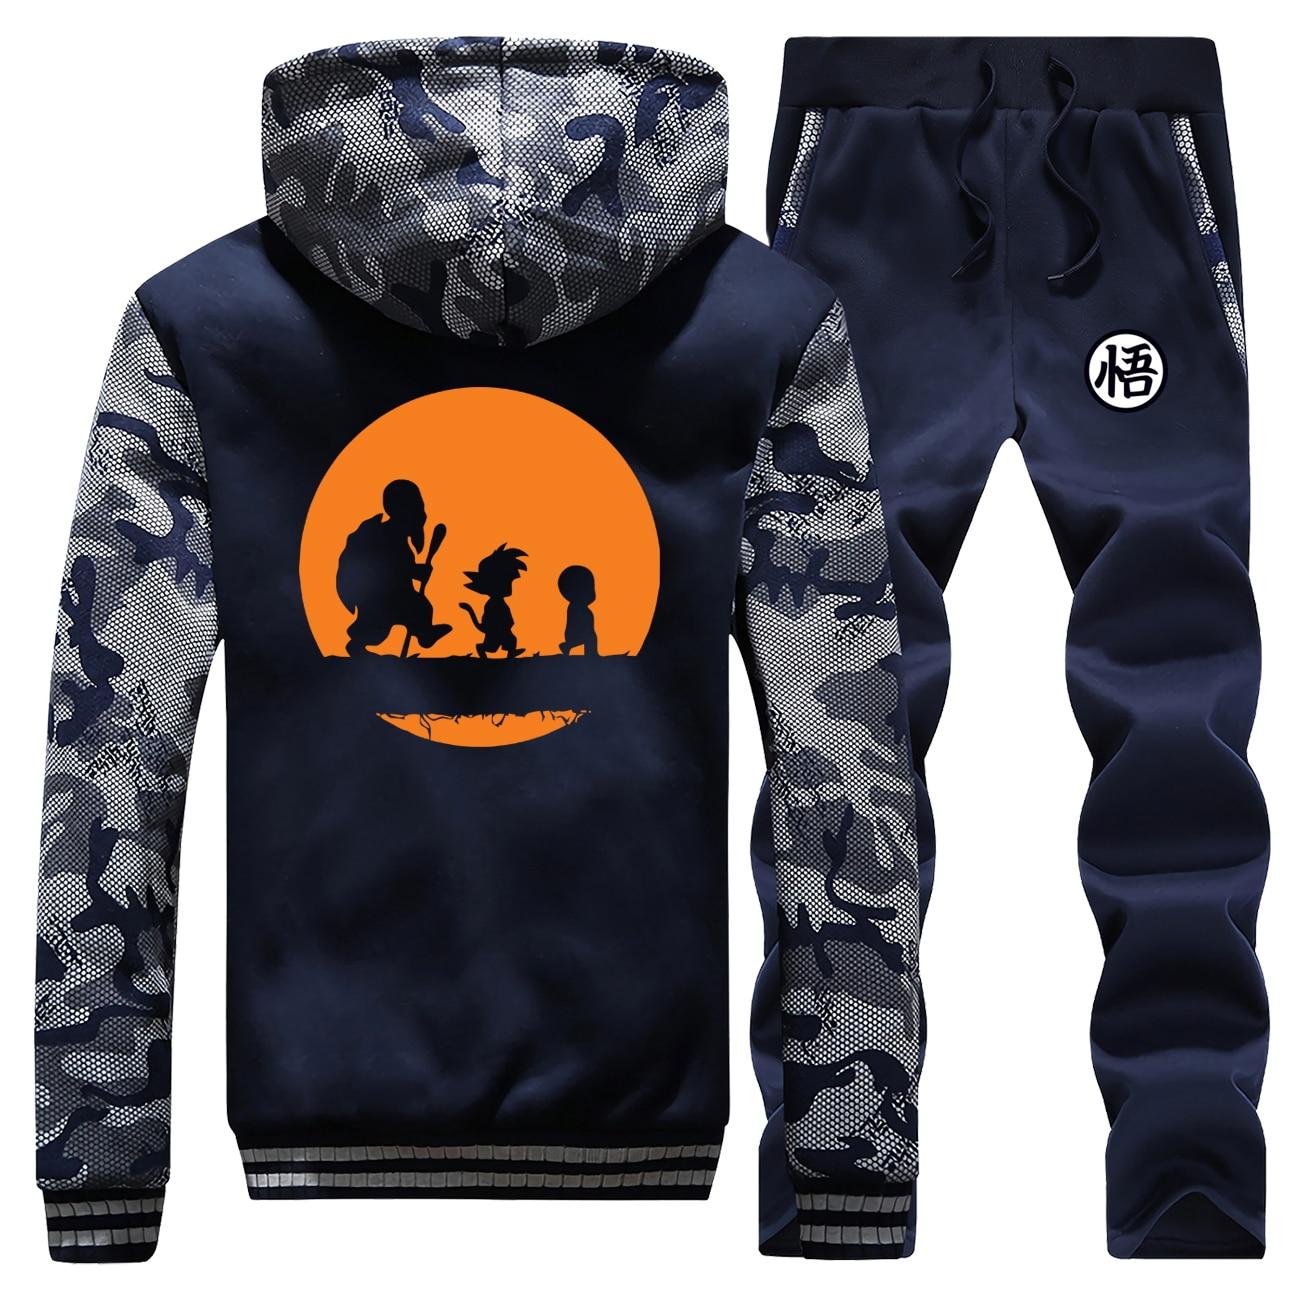 Anime Dragon Ball Z Men Hoodie Sweatshirt Master Roshi Goku Print Coat Zip Winter Warm Jacket+Pants 2 Piece Sets Mens Tracksuit